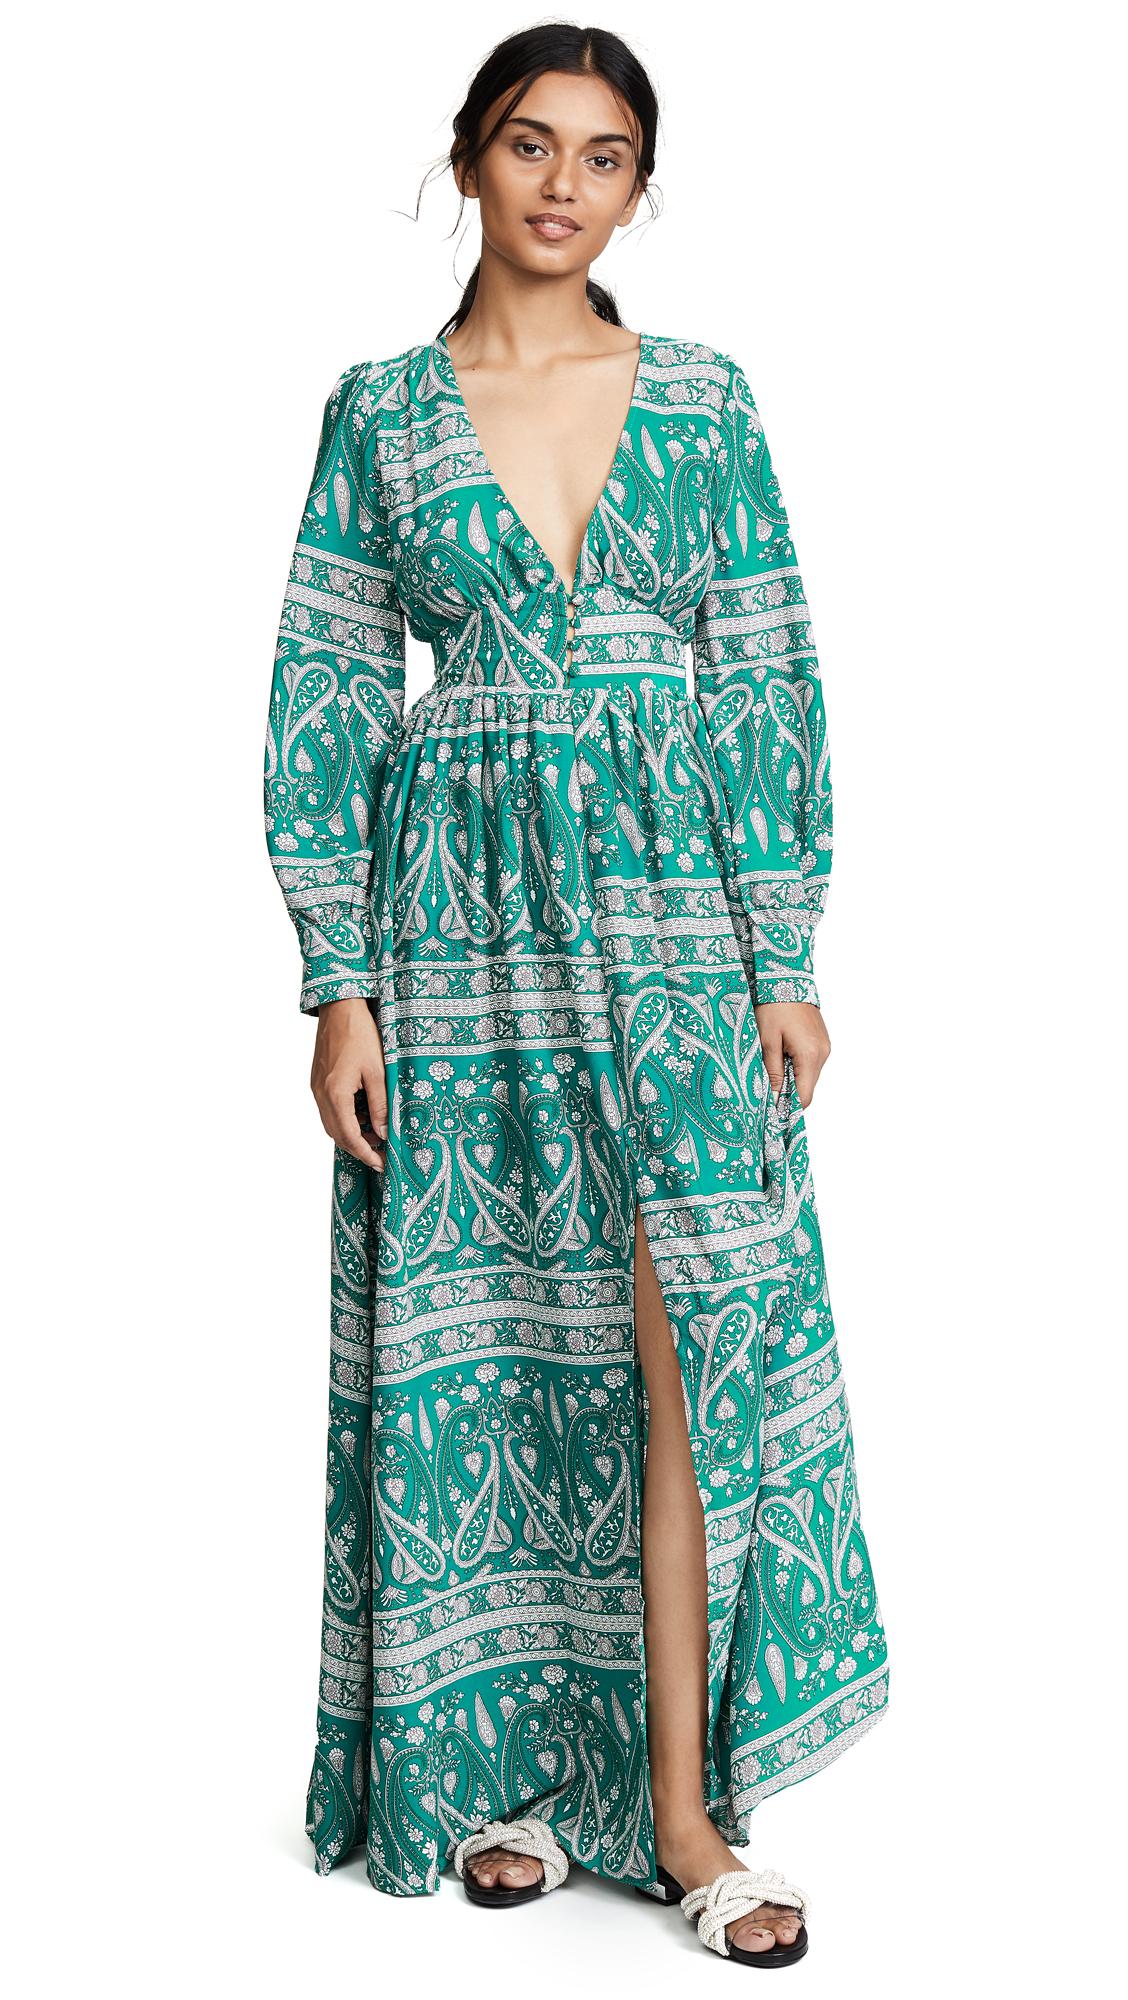 Glamorous Paisley Dress